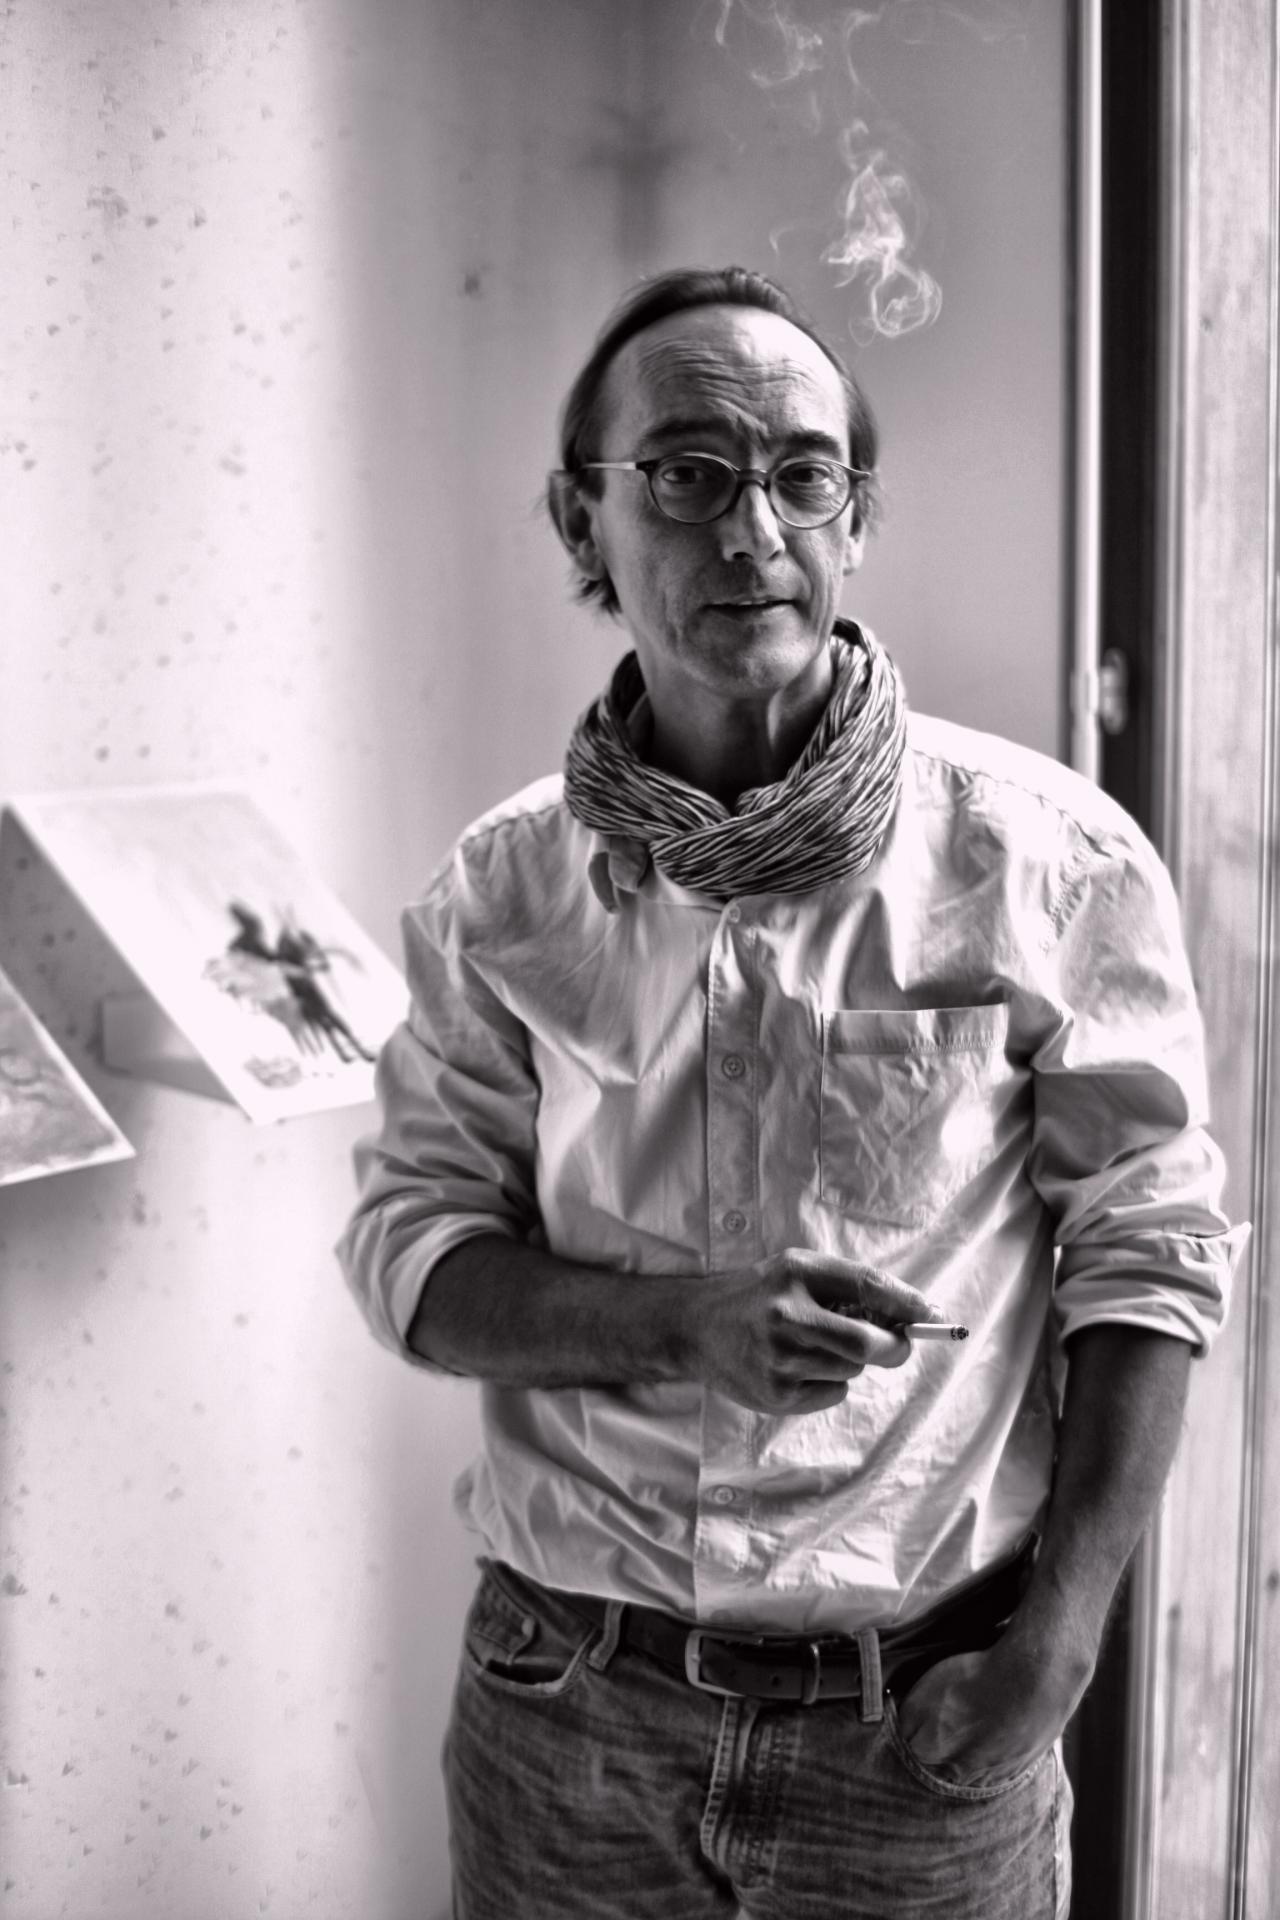 Pierre Faucher